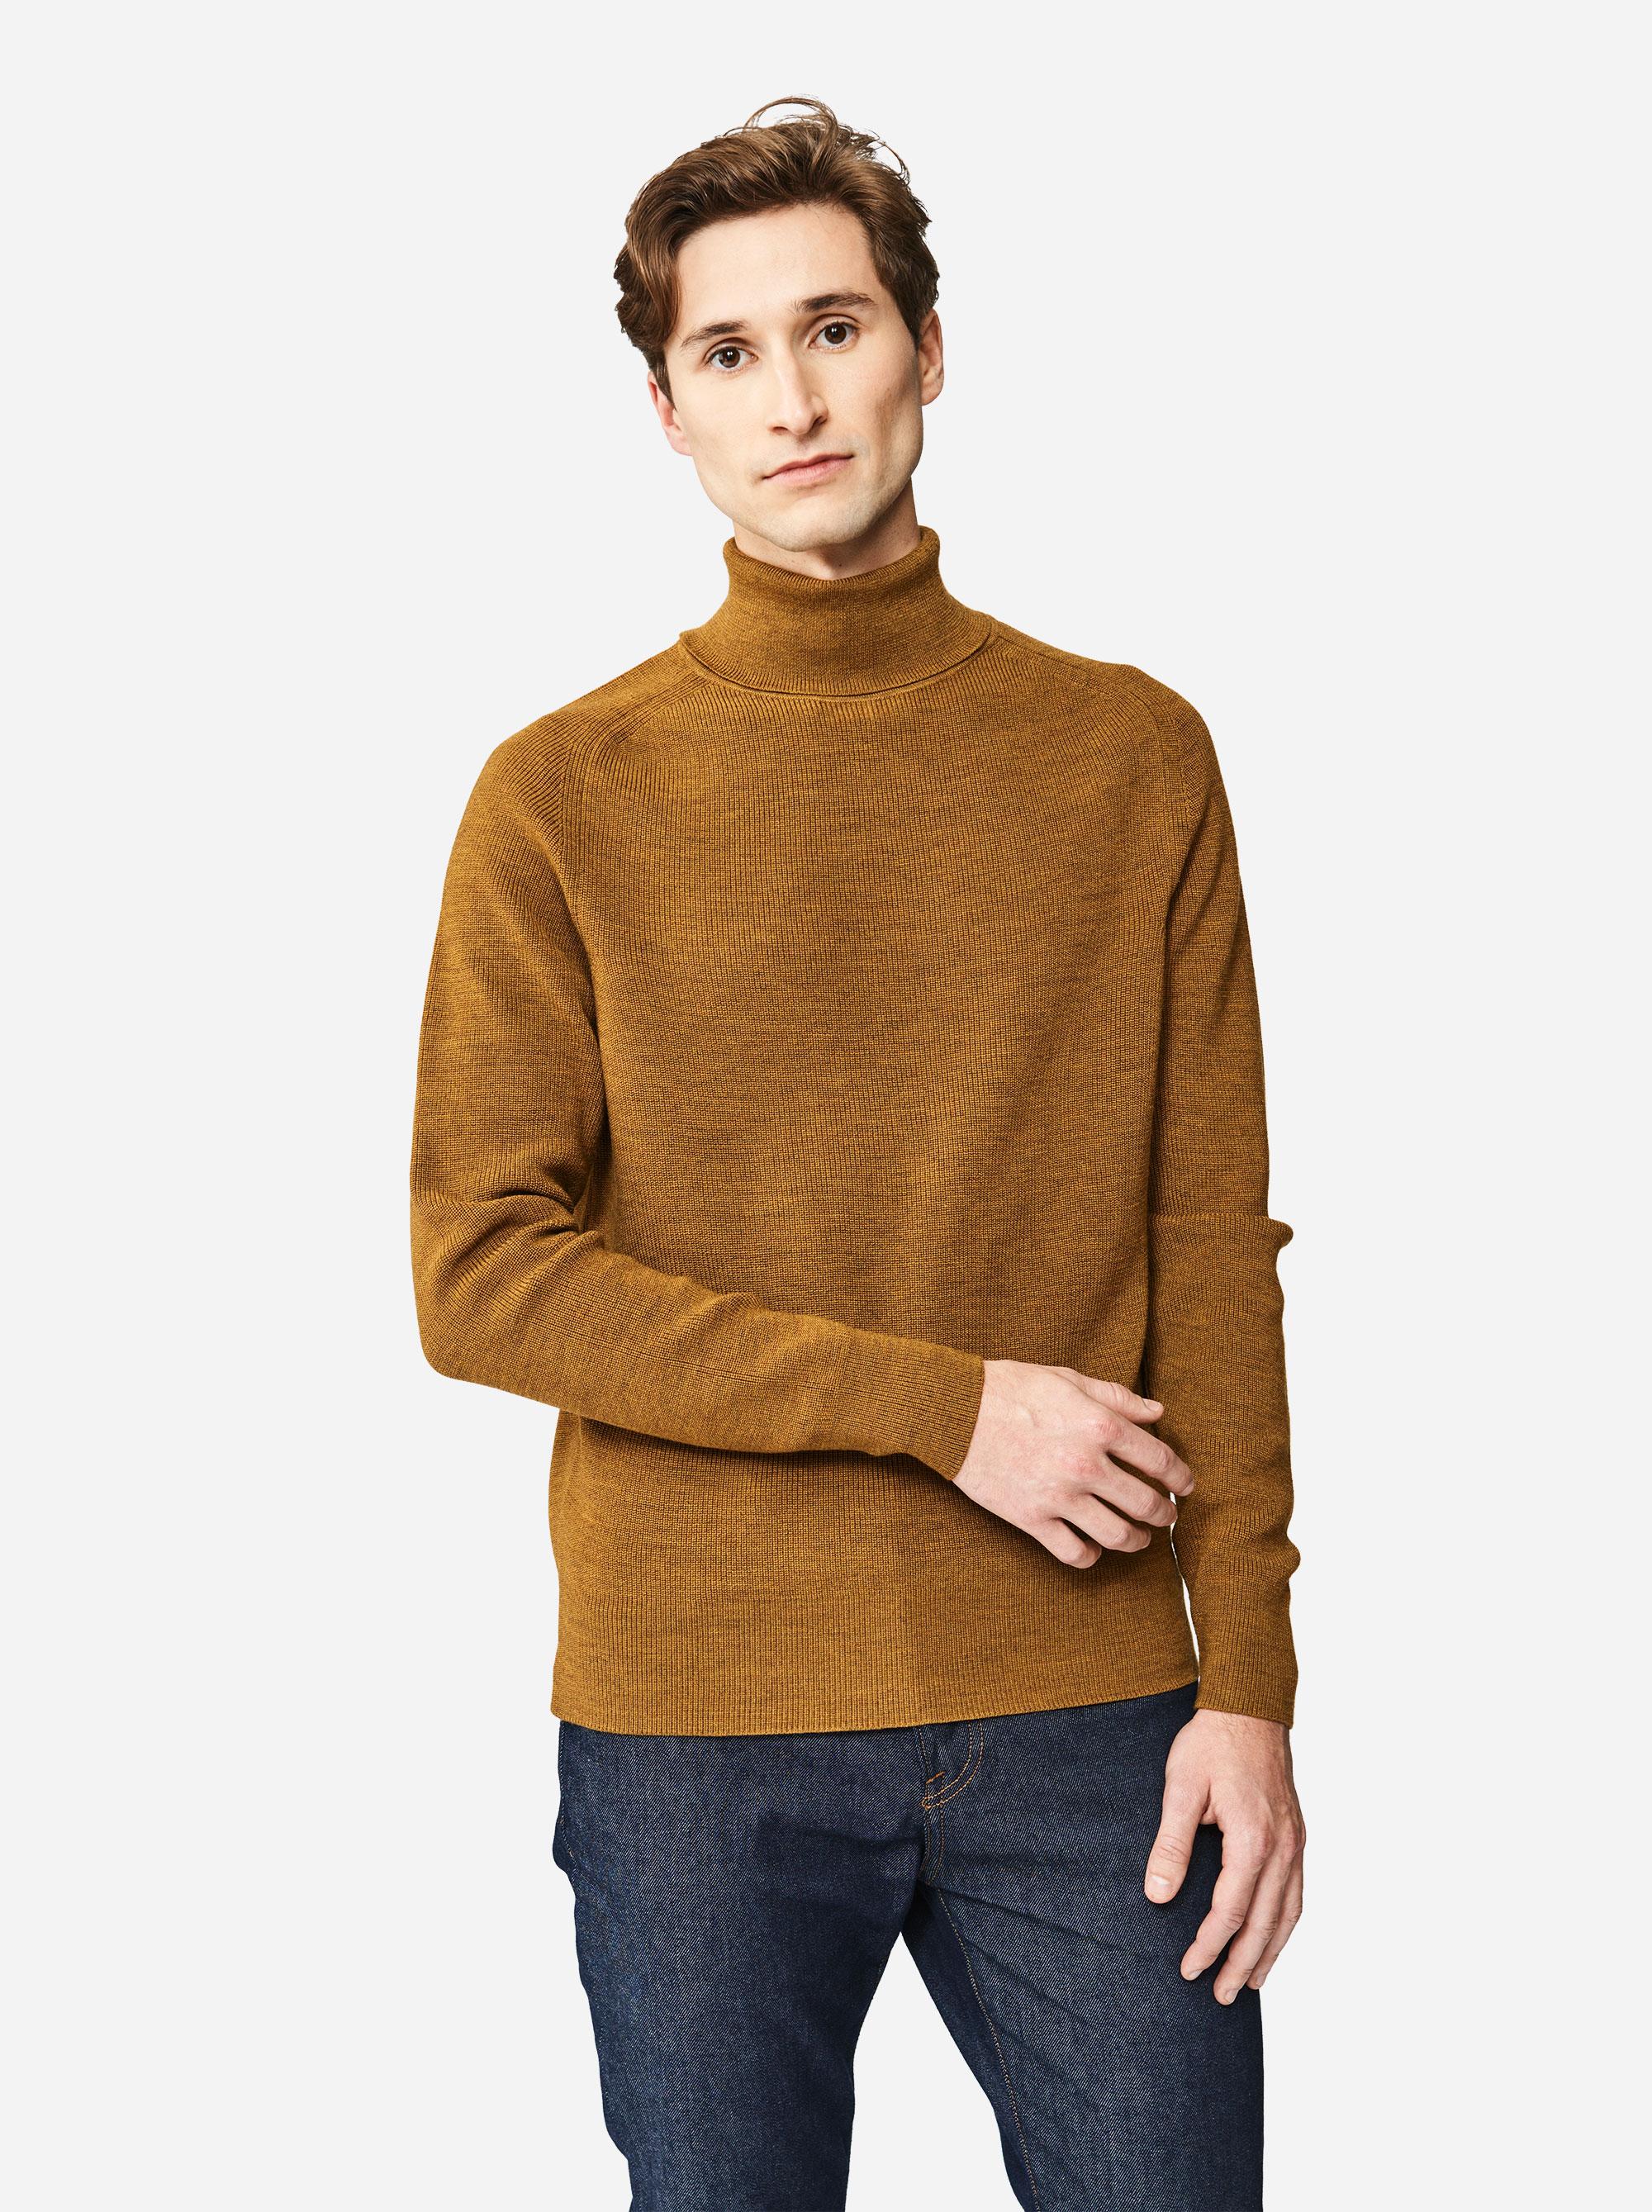 Teym - Turtleneck - The Merino Sweater - Men - Mustard - 1